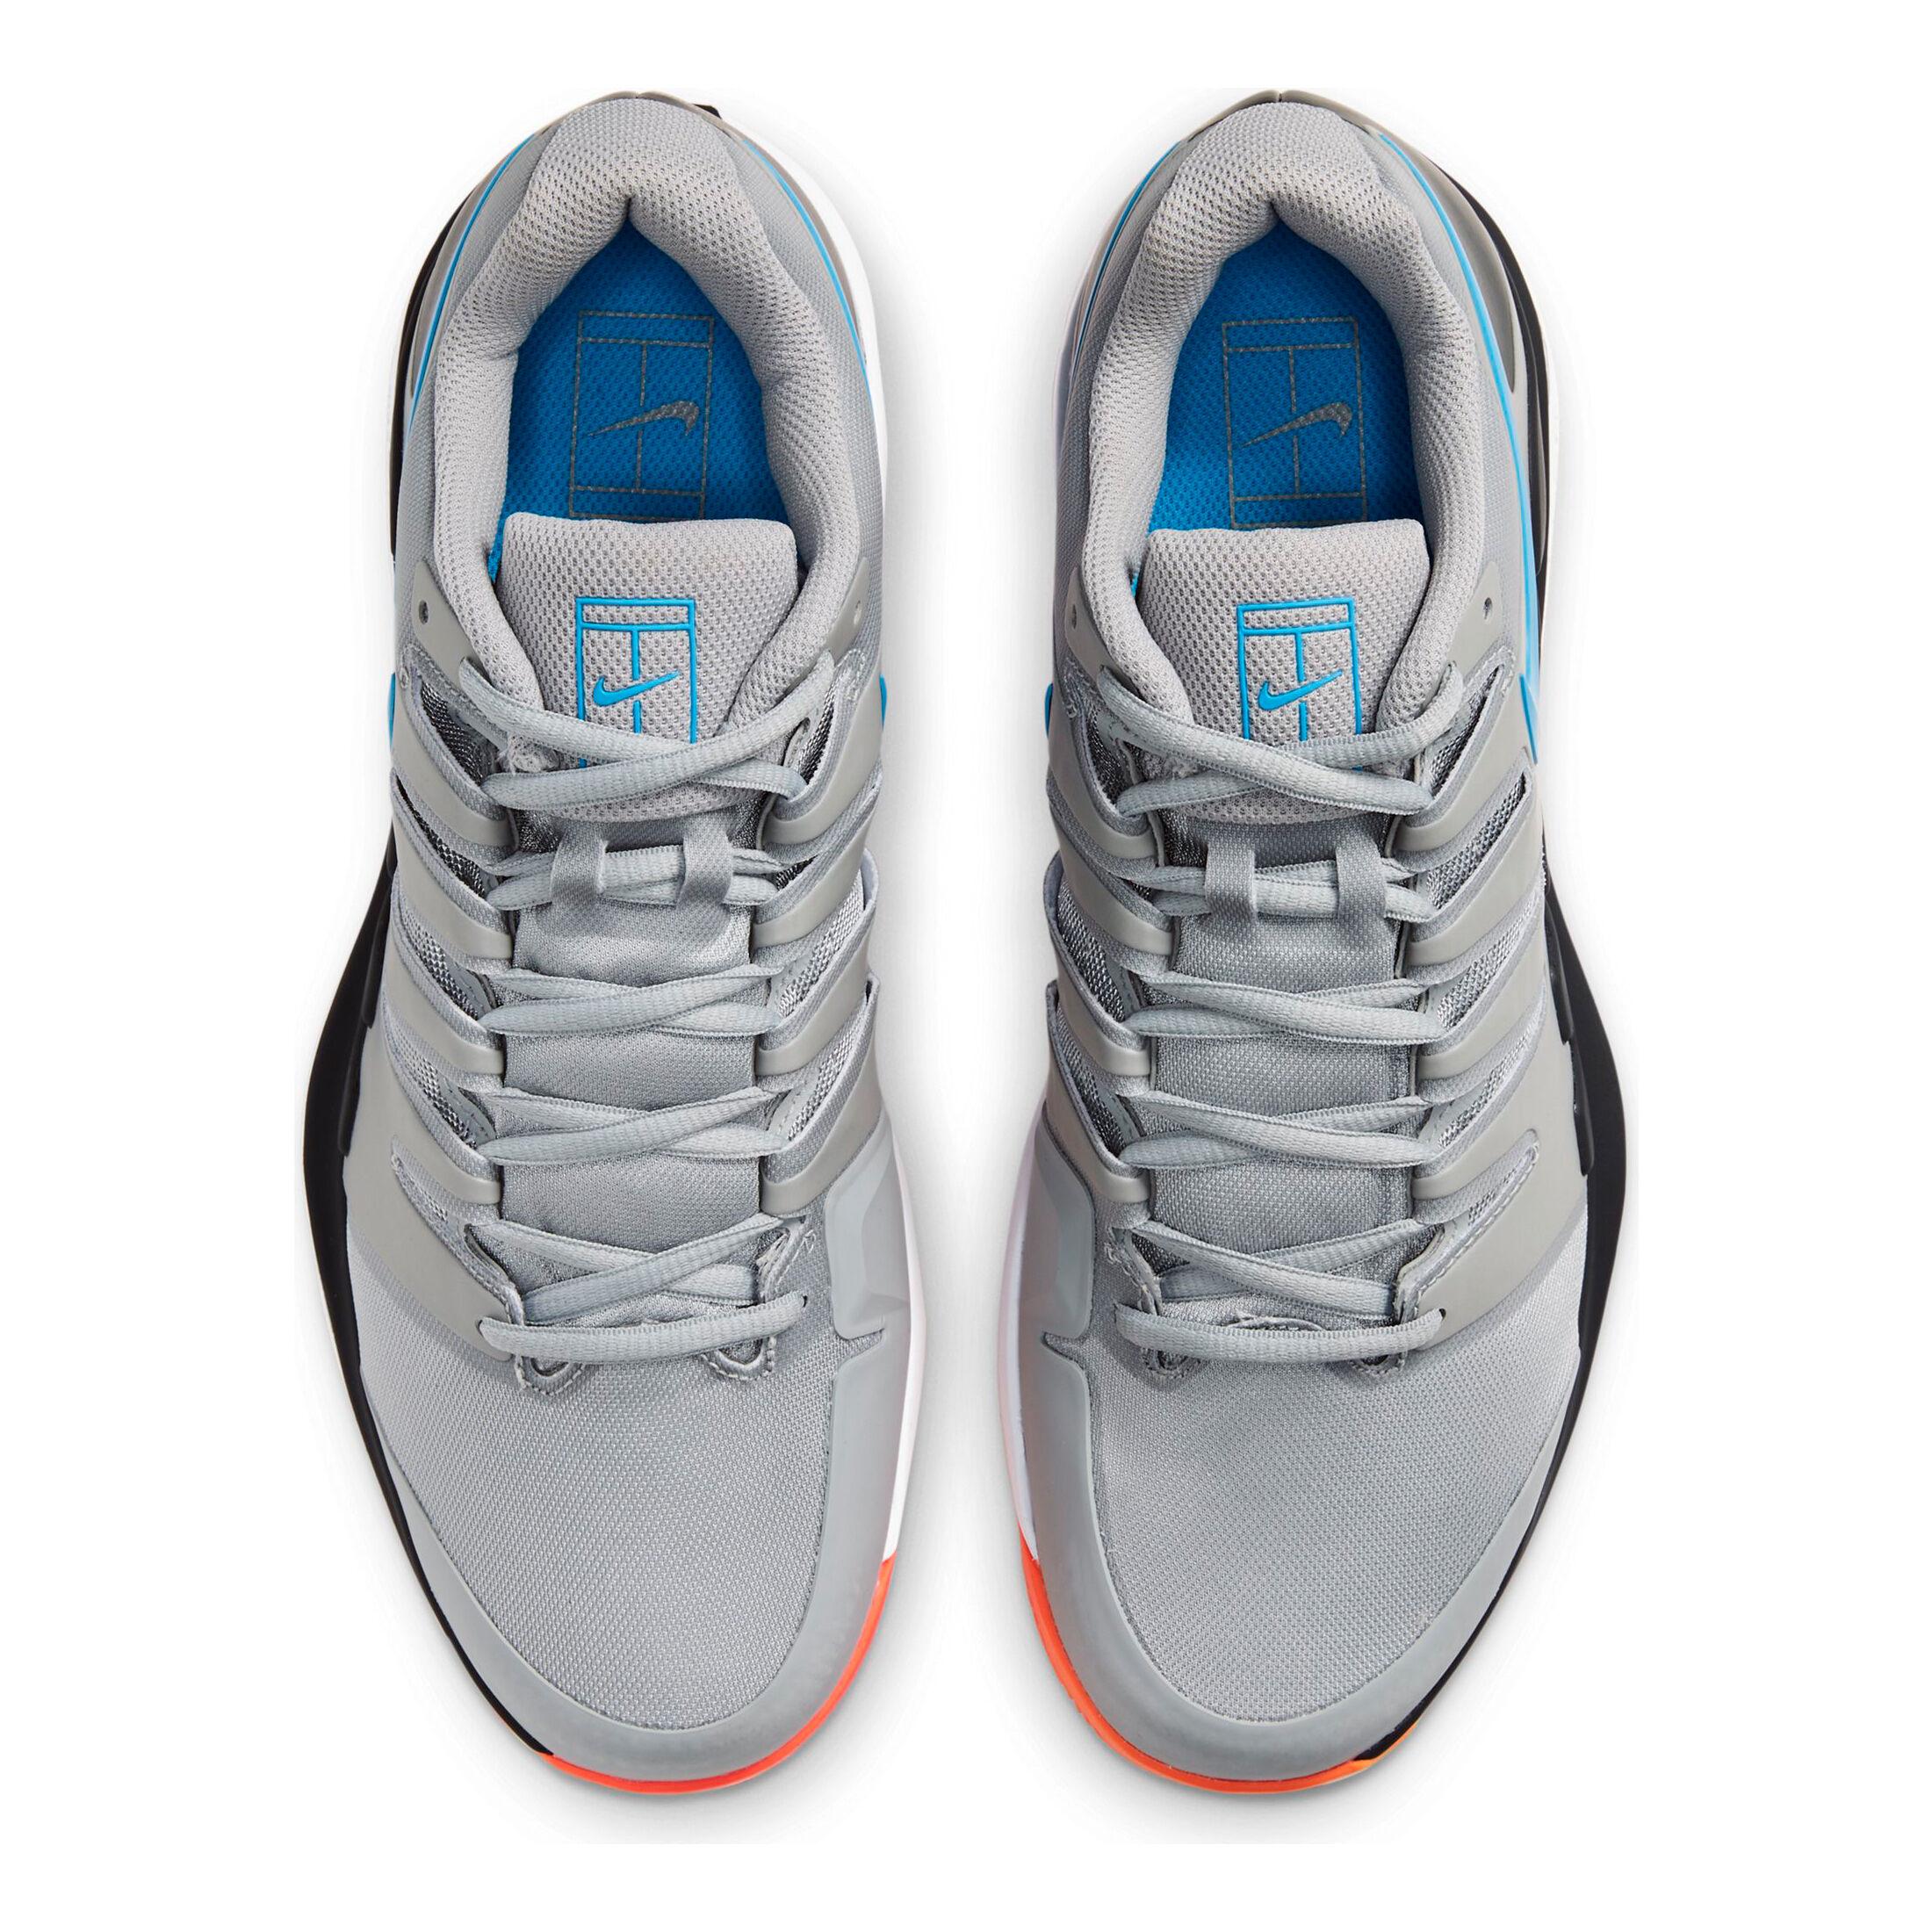 buy Nike Air Zoom Vapor X Clay Court Shoe Men - Grey, Blue online ...